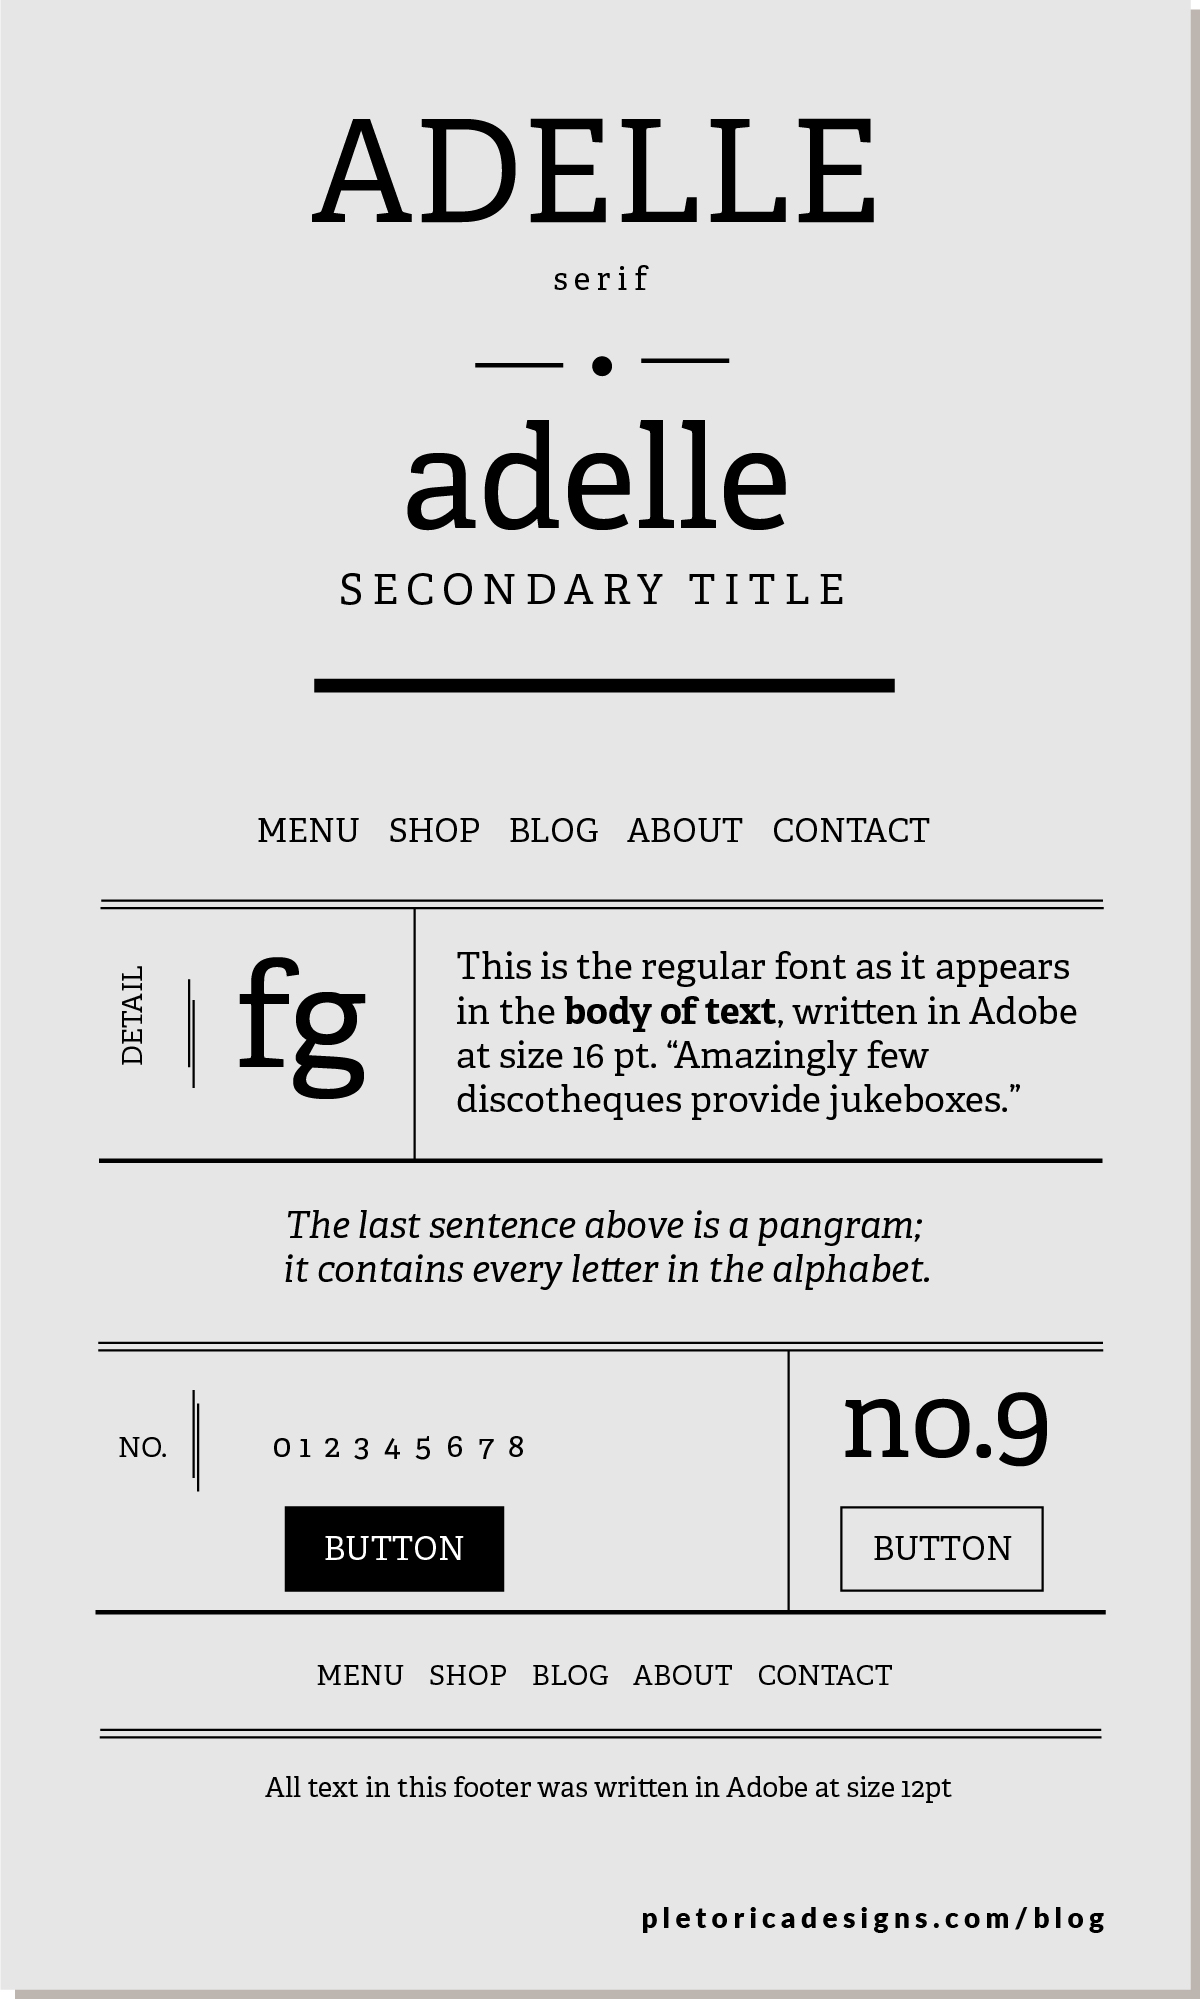 LET'S TYPE: Adelle — PLETÓRICA DESIGNS